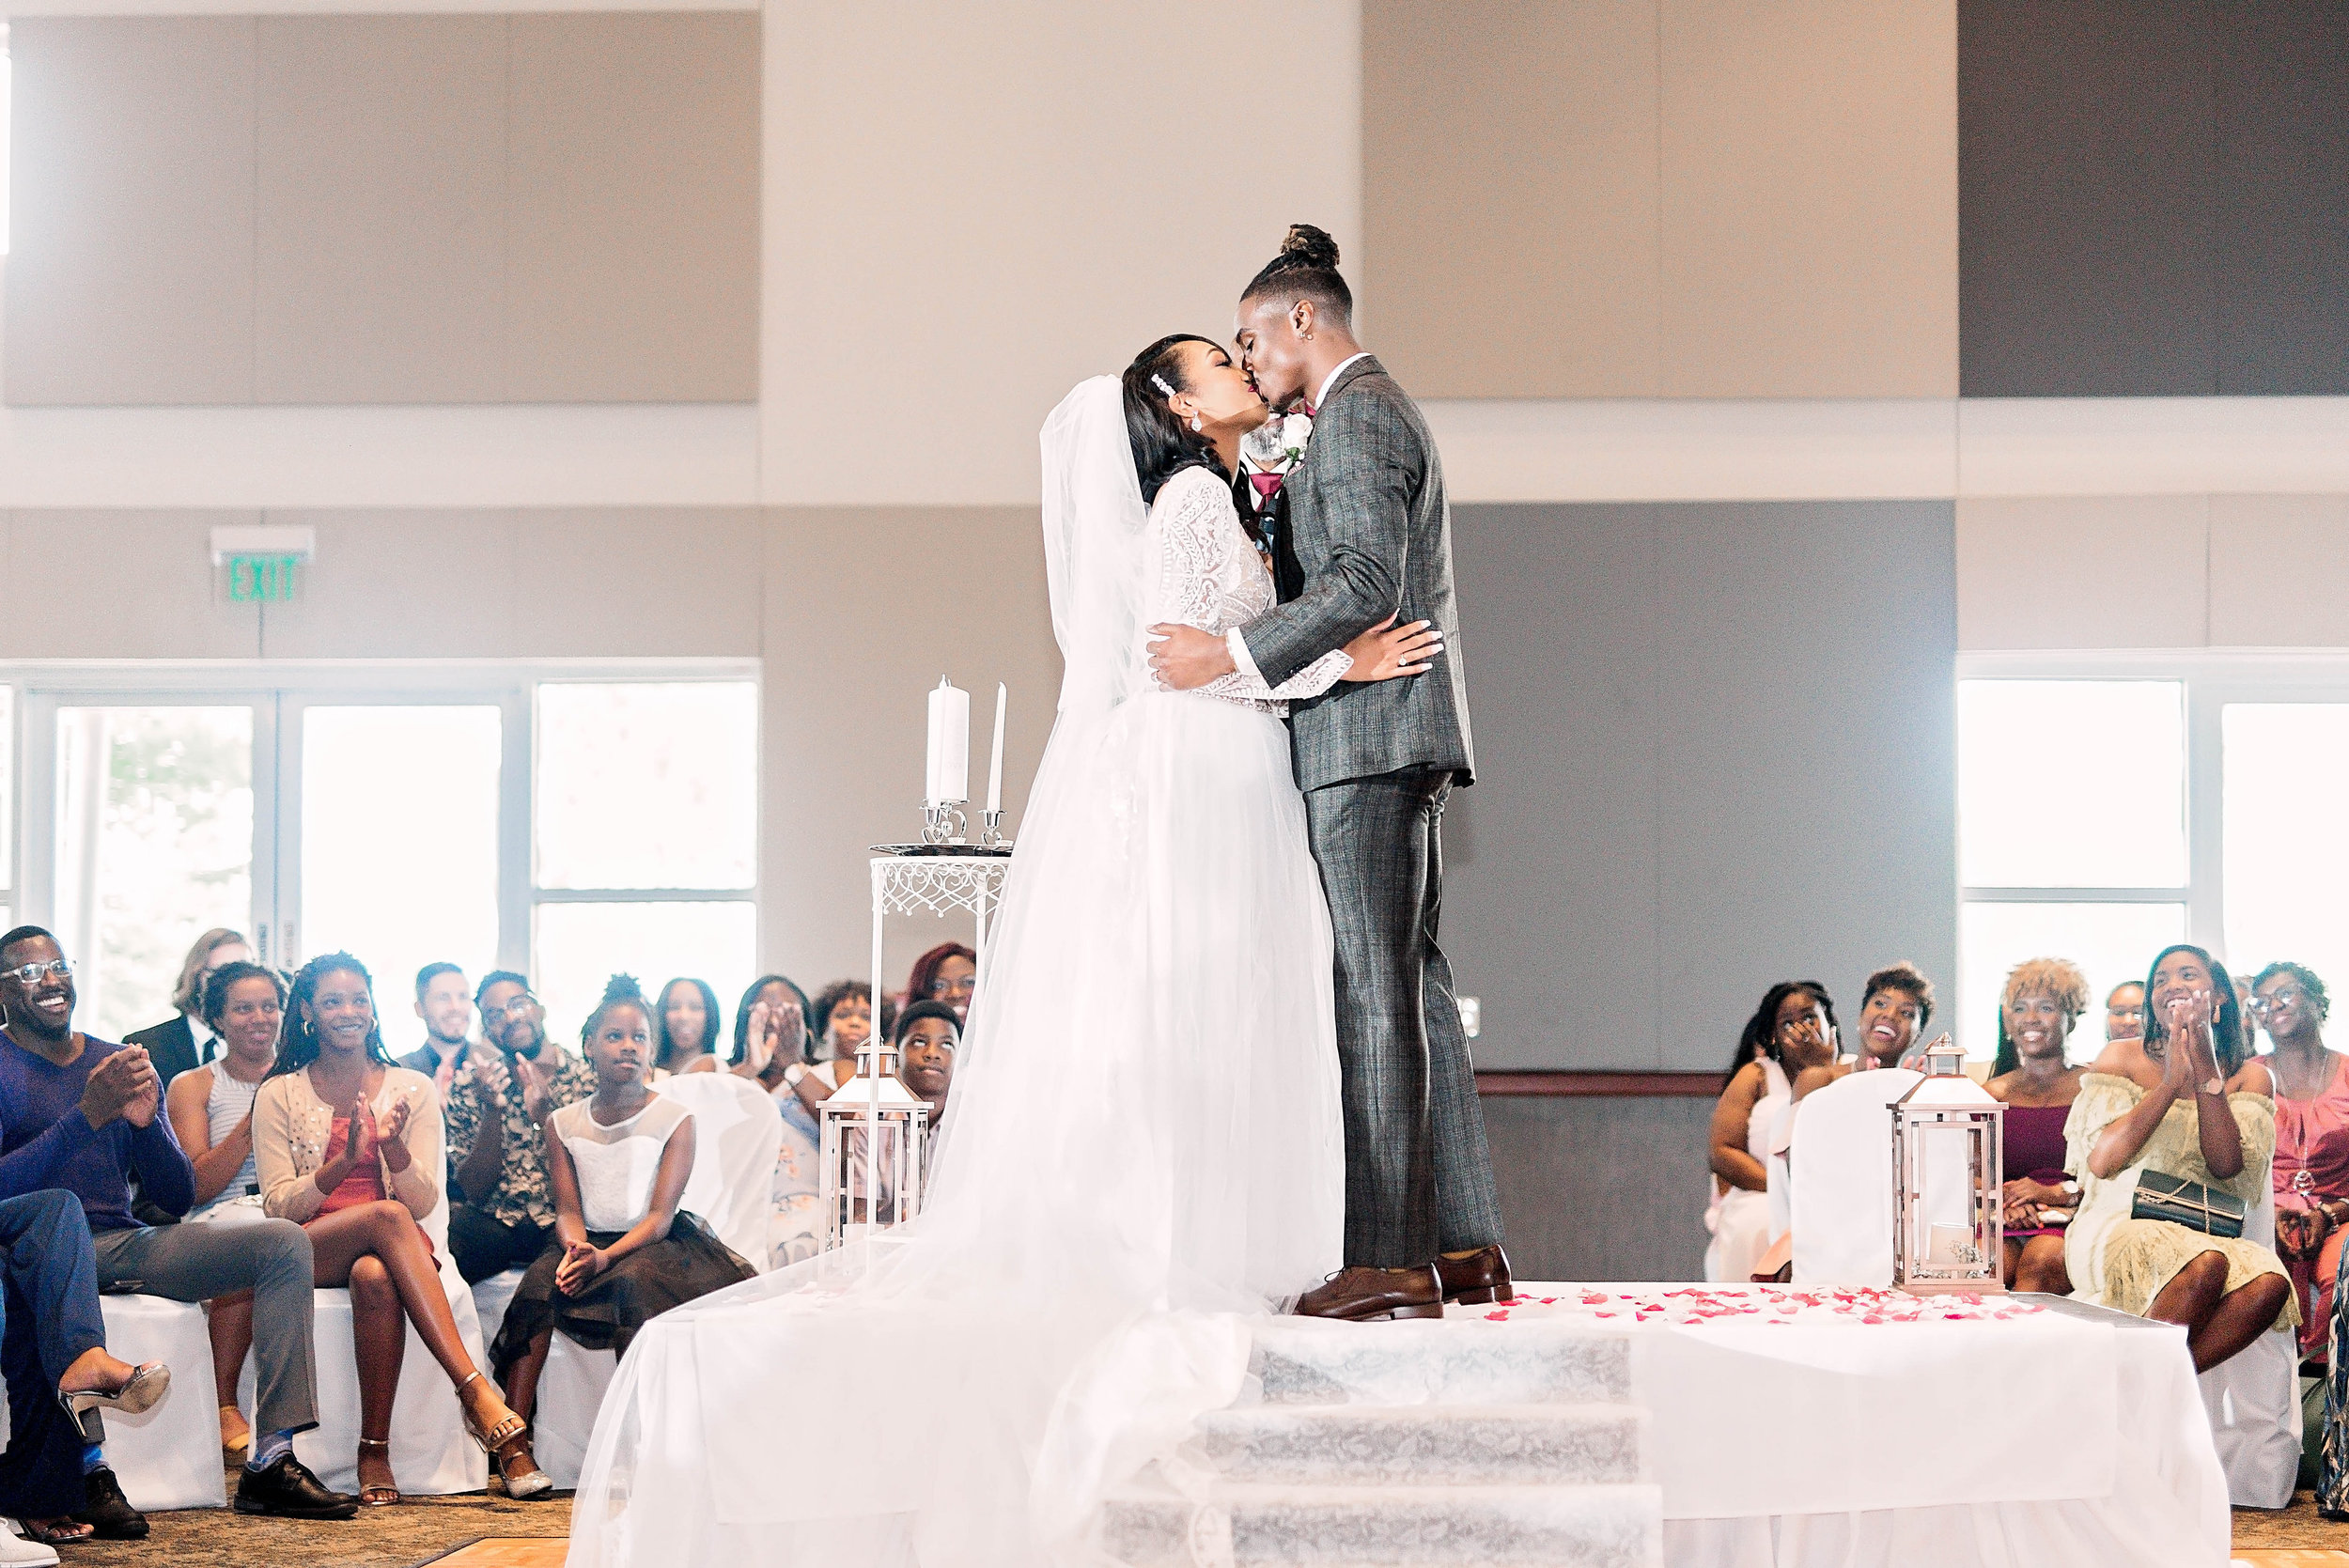 Dallas Wedding- Pharris Photography- Ceremony- Kaimyn + Ezra- First Kiss